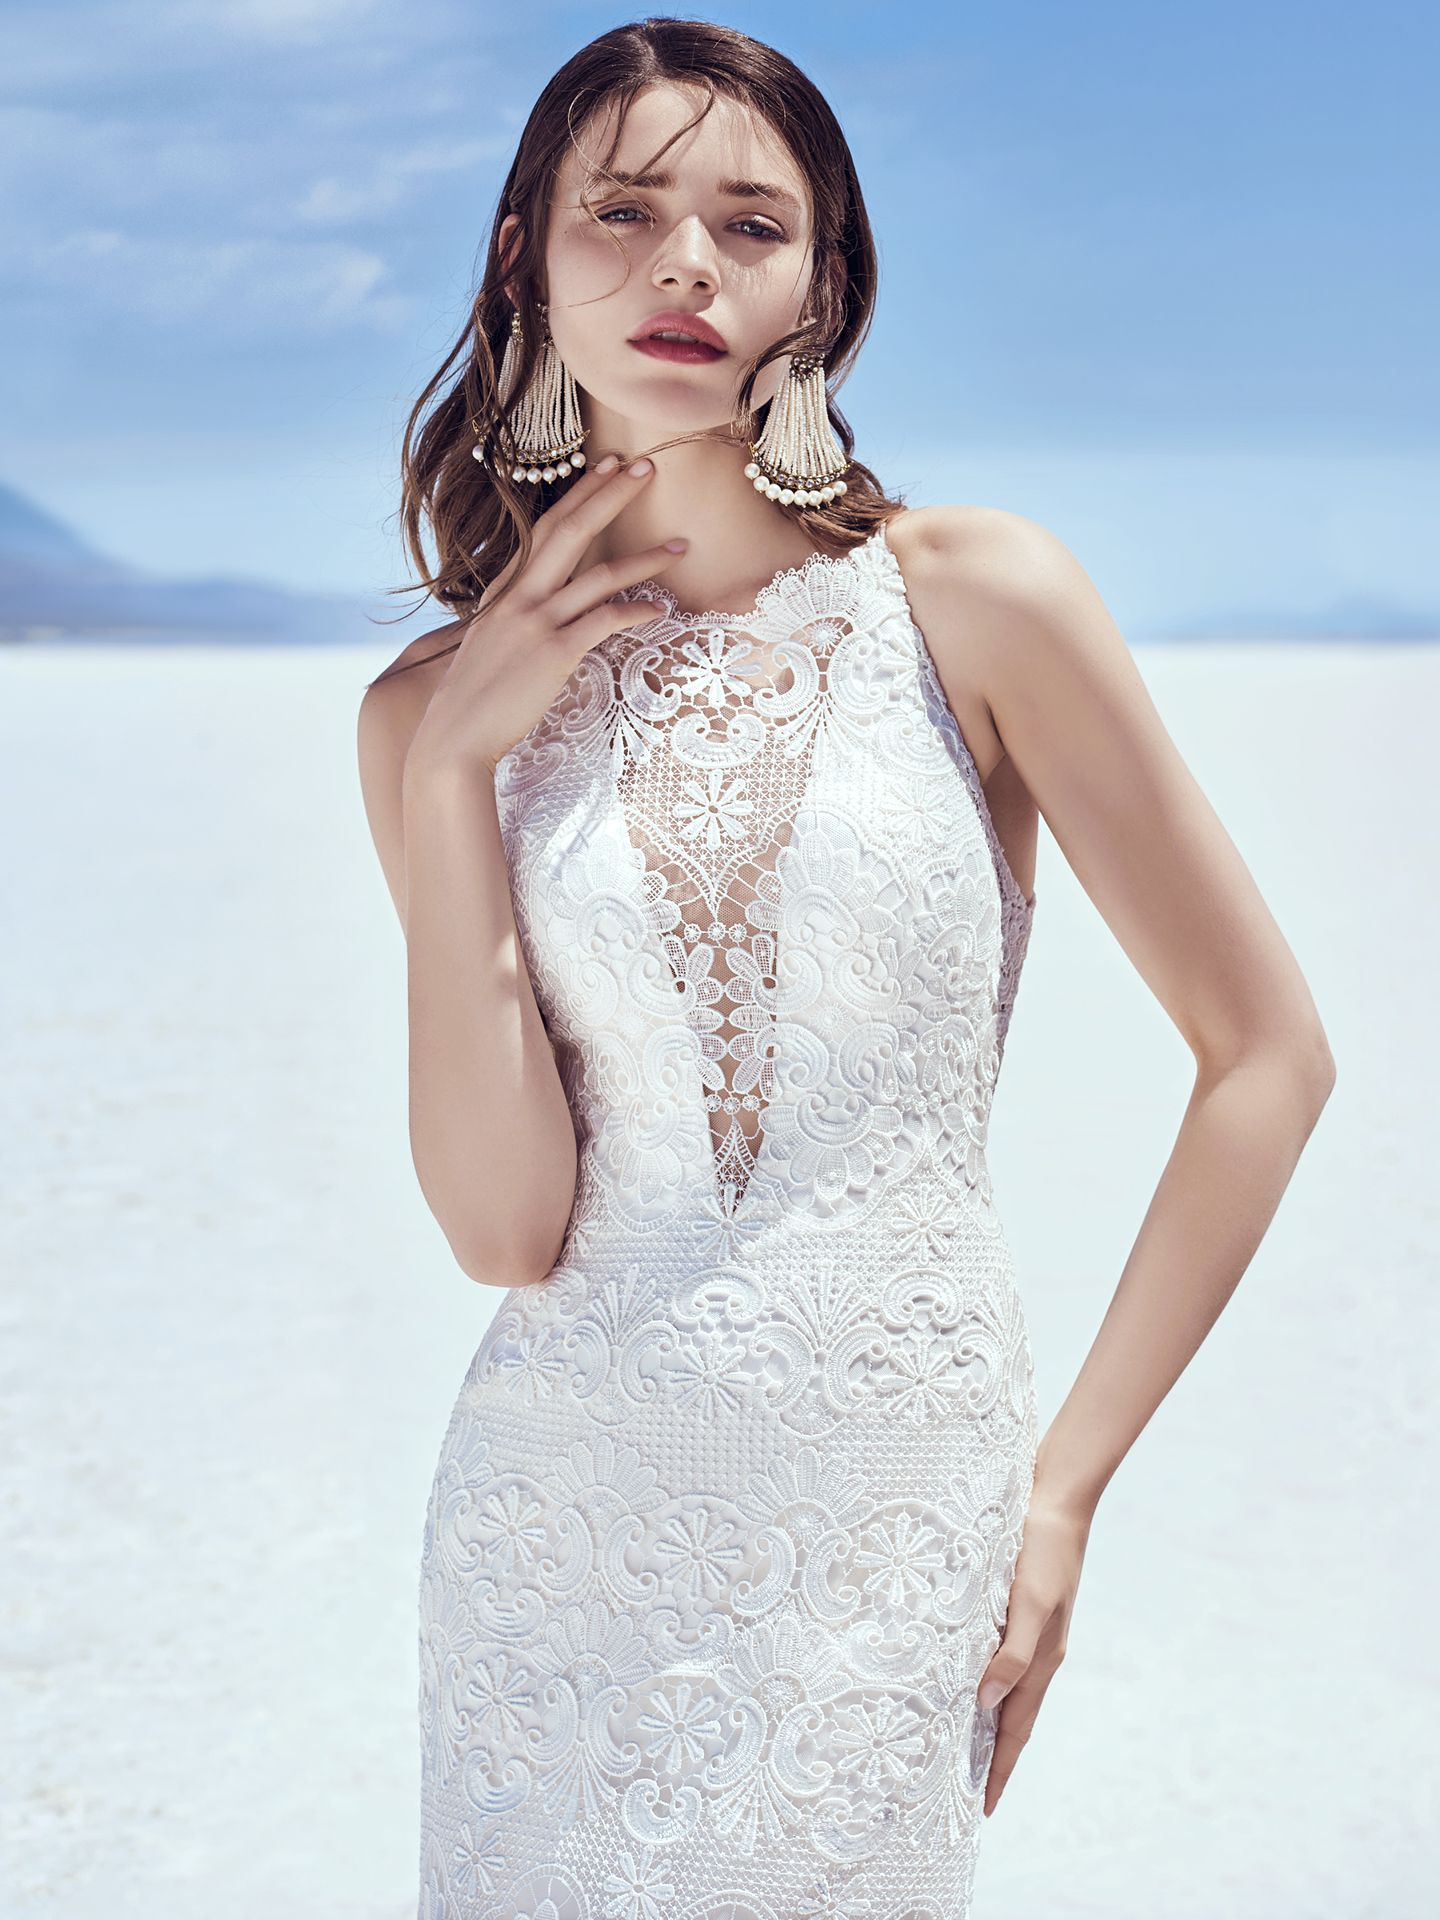 Zayn wedding dress for boho muse—a modern and feminine slip style. - The Latest Wedding Dress Trends for Engagement Season 2018